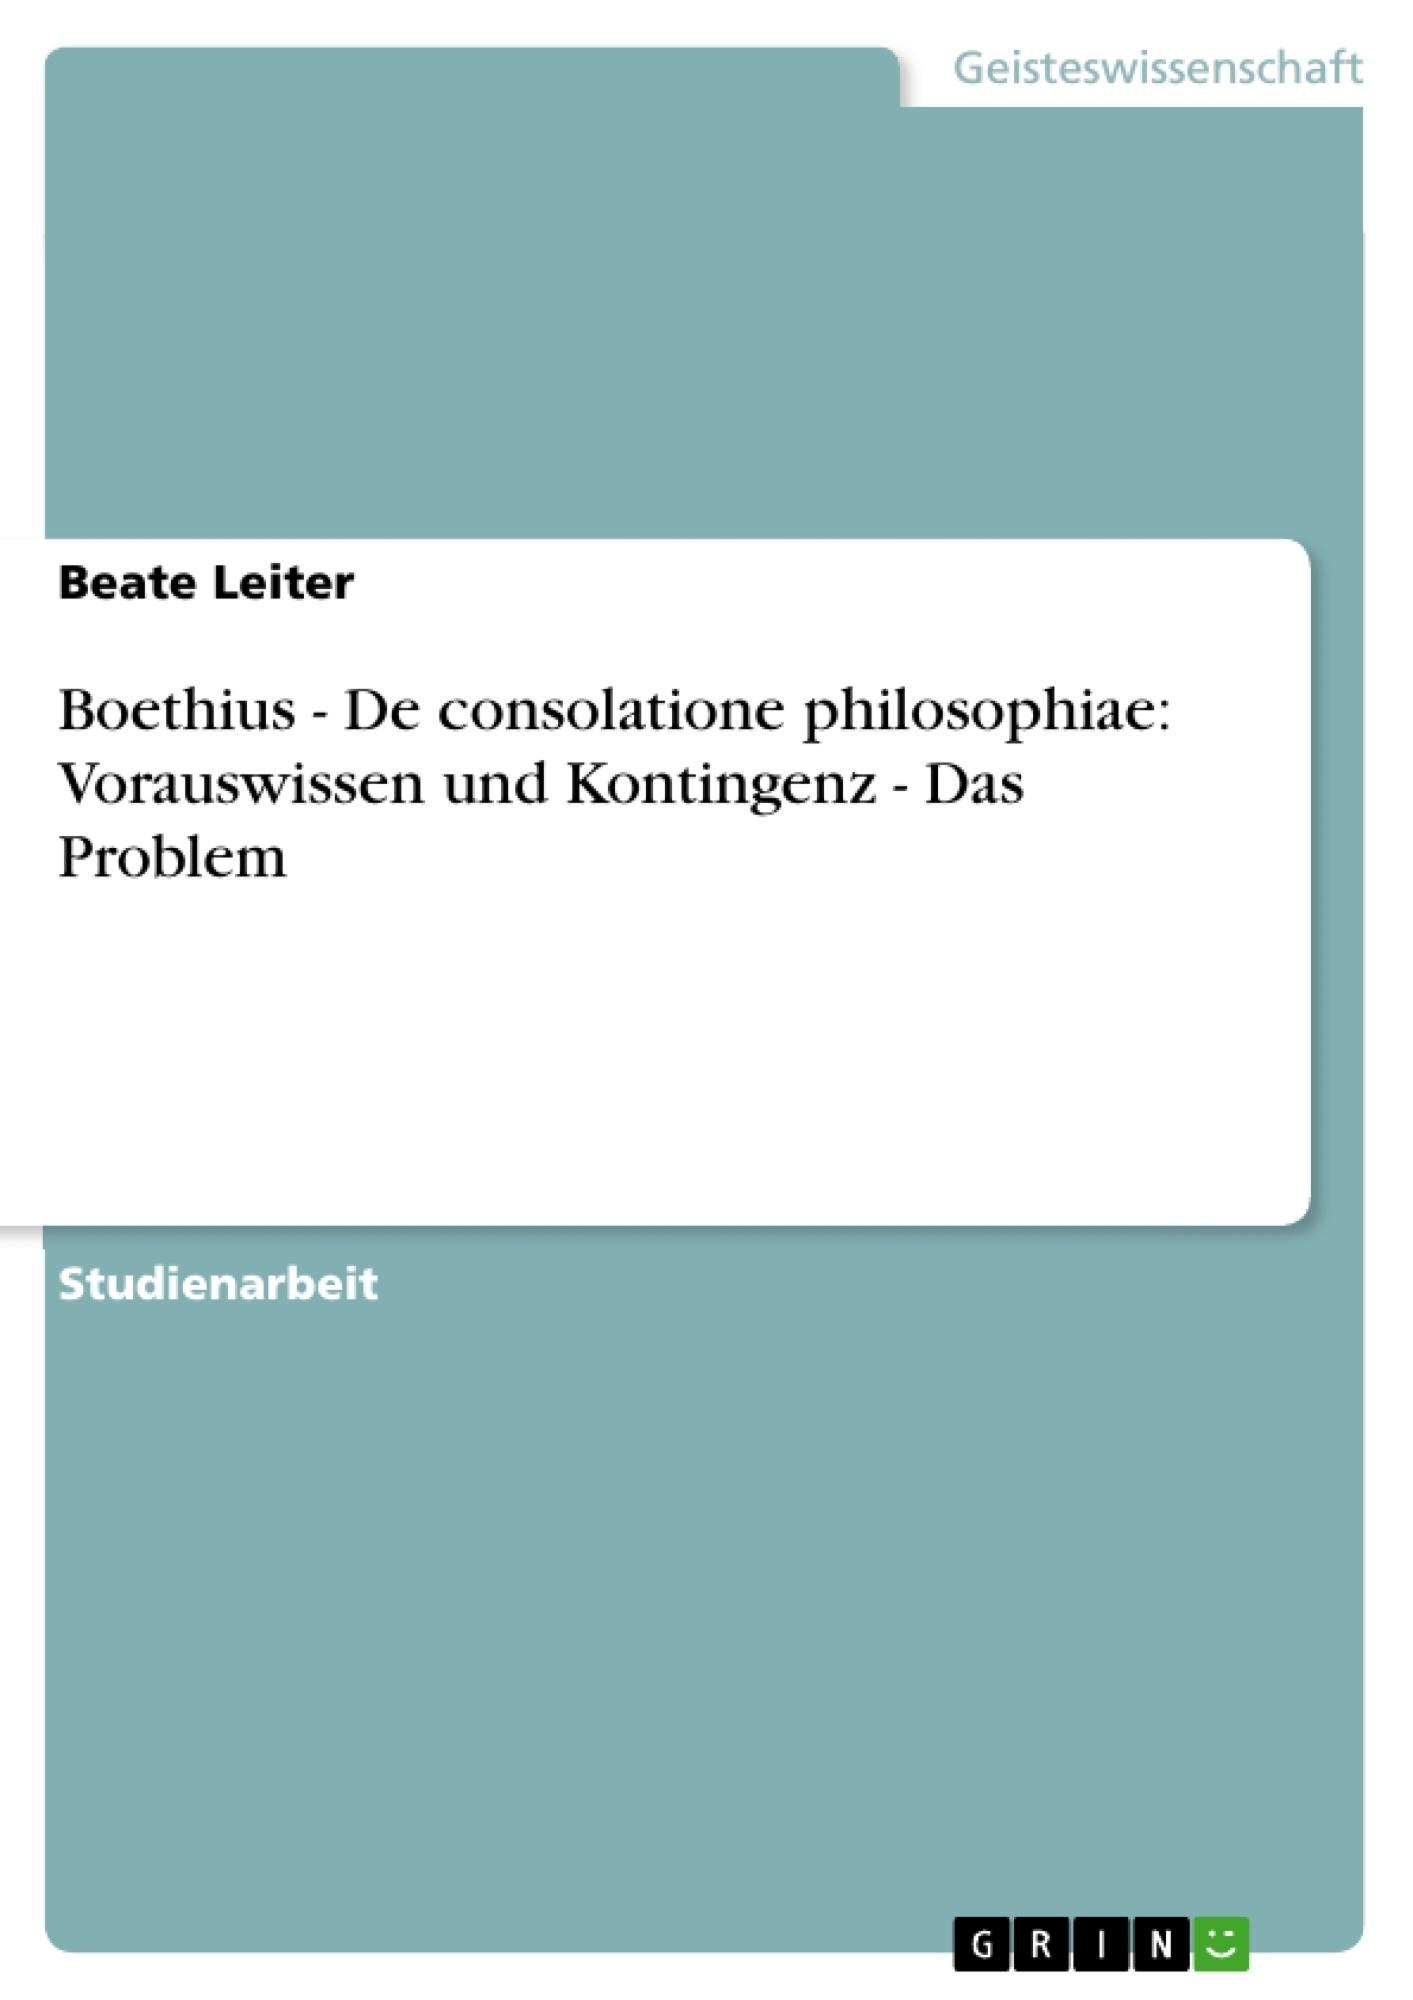 Titel: Boethius - De consolatione philosophiae: Vorauswissen und Kontingenz - Das Problem